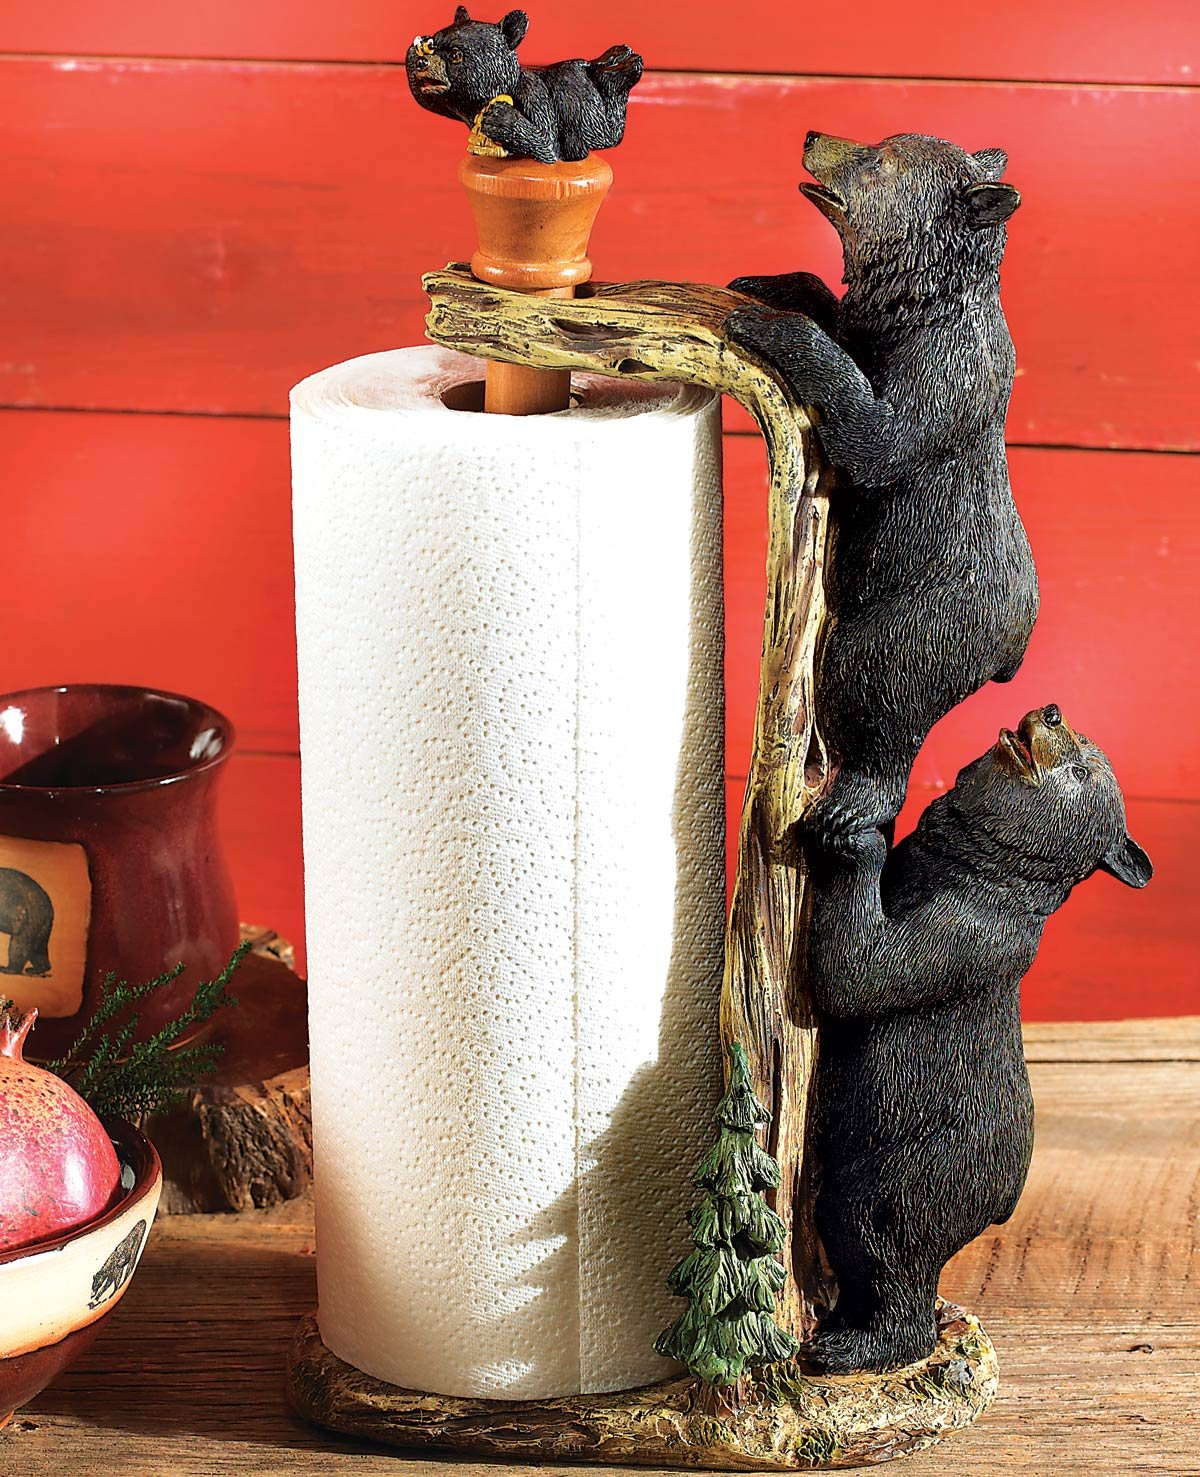 Black Bear Paper Towel Holder - Cabin Kitchen Decor